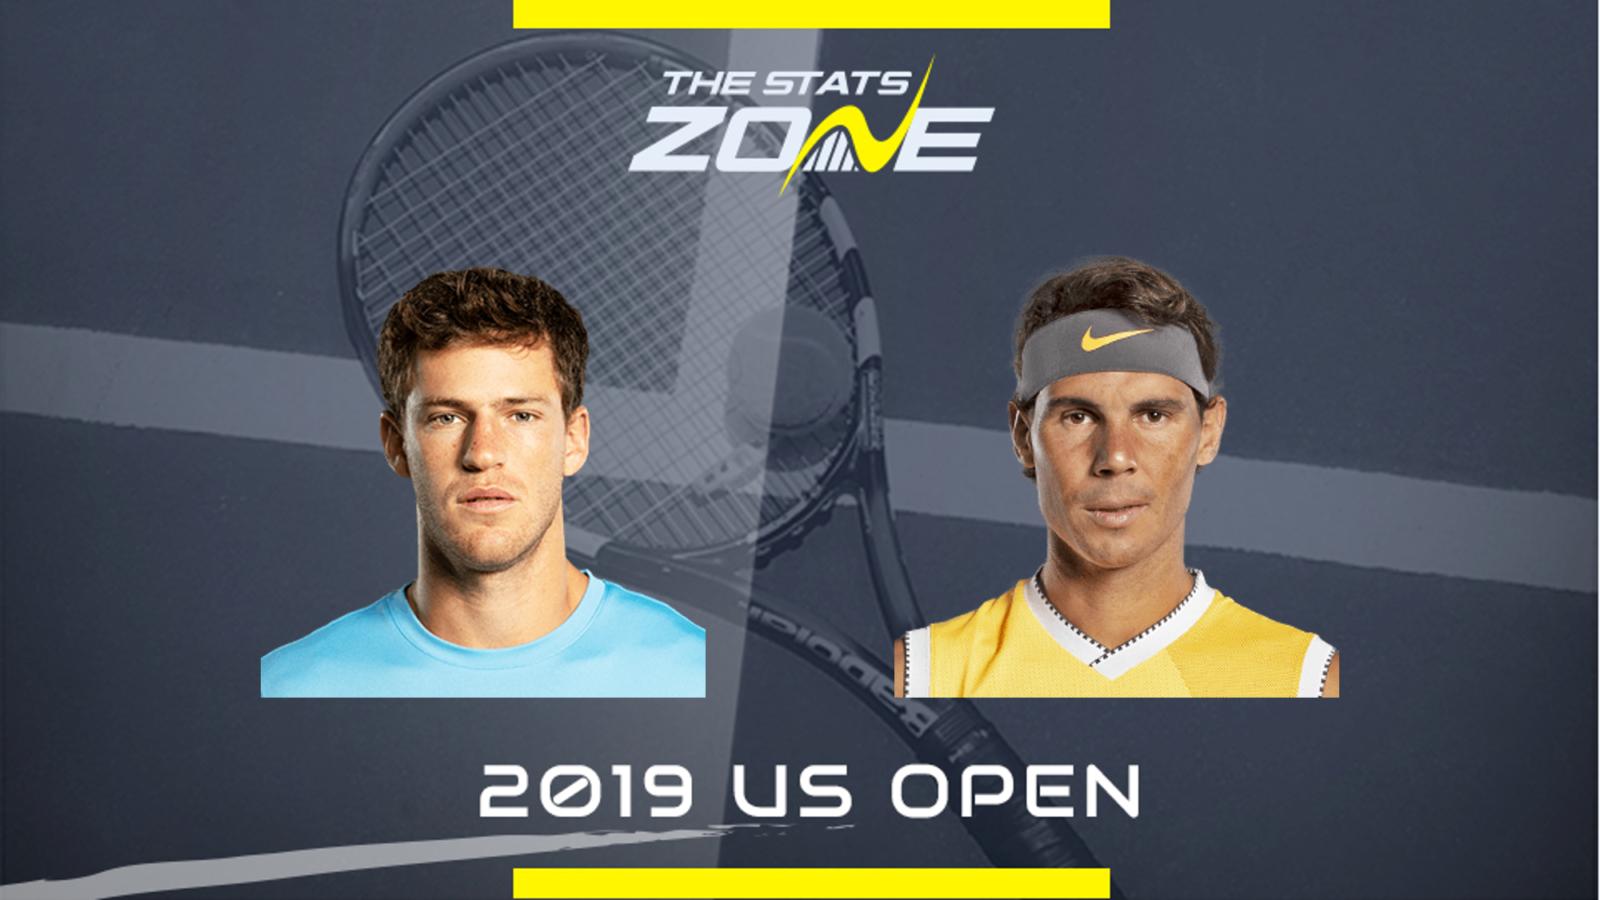 2019 Us Open Diego Schwartzman Vs Rafael Nadal Preview Prediction The Stats Zone